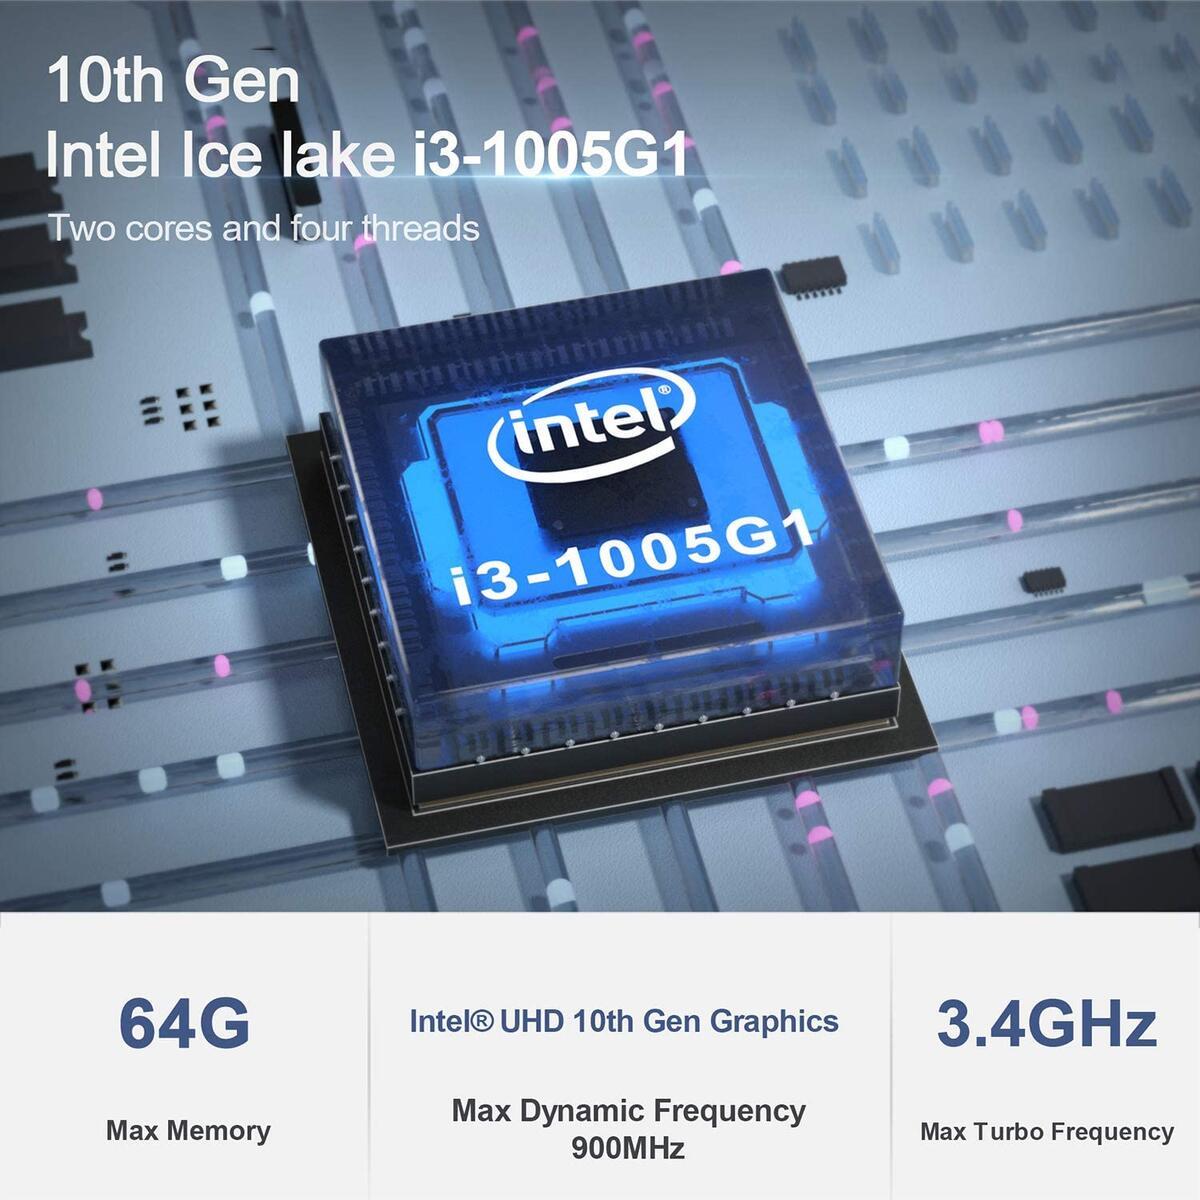 Beelink Dual-Core Intel 10th Gen Core i3-1005G1 3.4Ghz Sei10 Mini PC 8GB RAM 256GB NVMe M.2 SSD Windows 10 Pro Mini Desktop Computer Support 4K@60hz Dual HDMI (8GB+256GB/Intel 10th Core i3 1005G1)